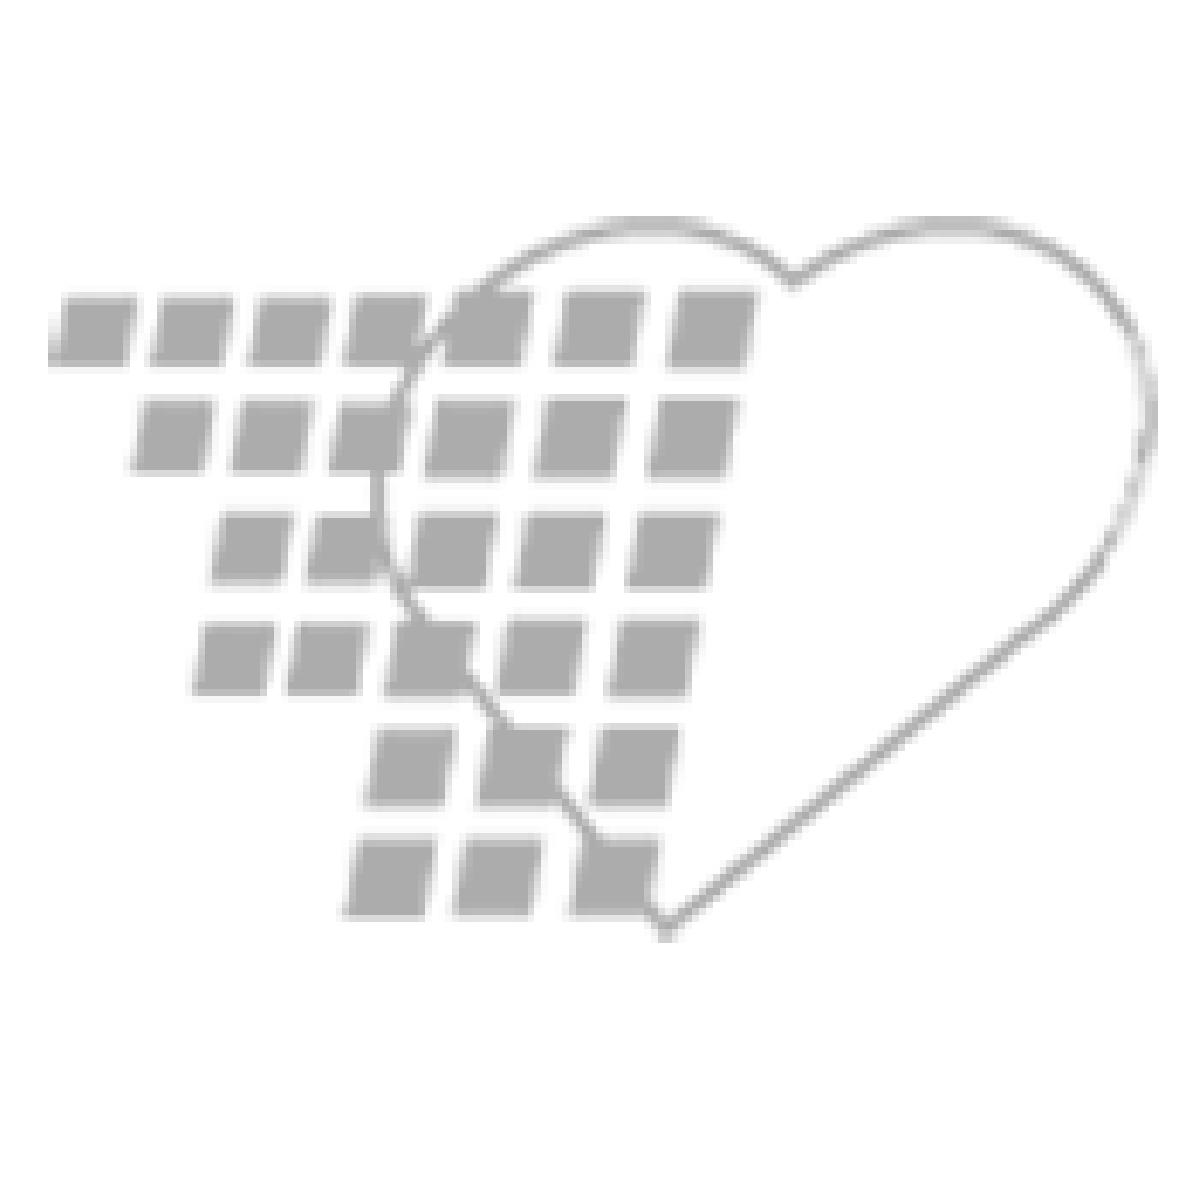 02-20-6012 Advantage™ Semi-Automatic Digital Blood Pressure Monitor